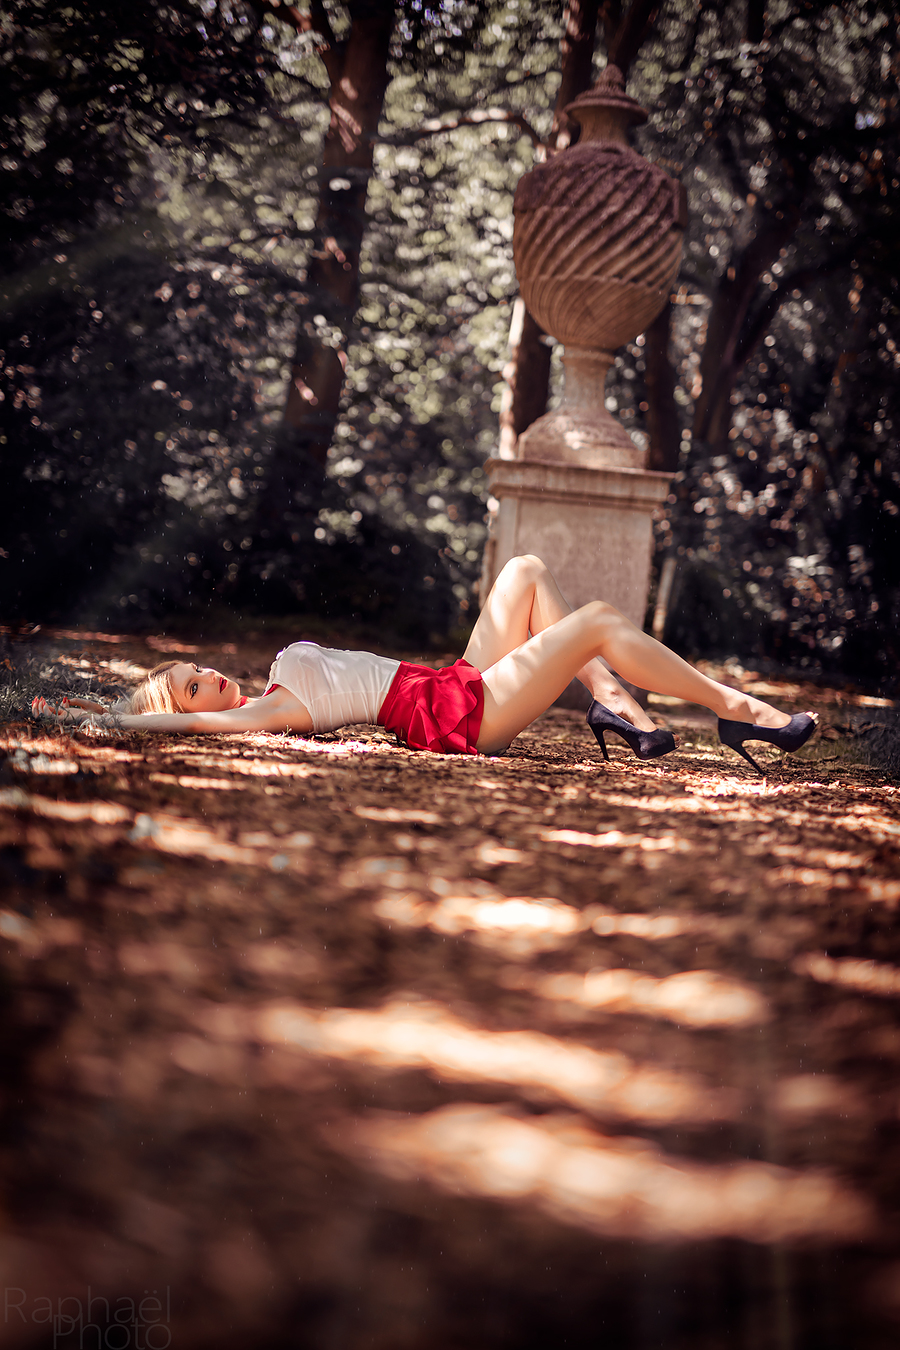 Imagination creates the future ♥ / Photography by RaphaelPhoto, Model Nadia Chloe Rose / Uploaded 5th July 2018 @ 09:51 AM